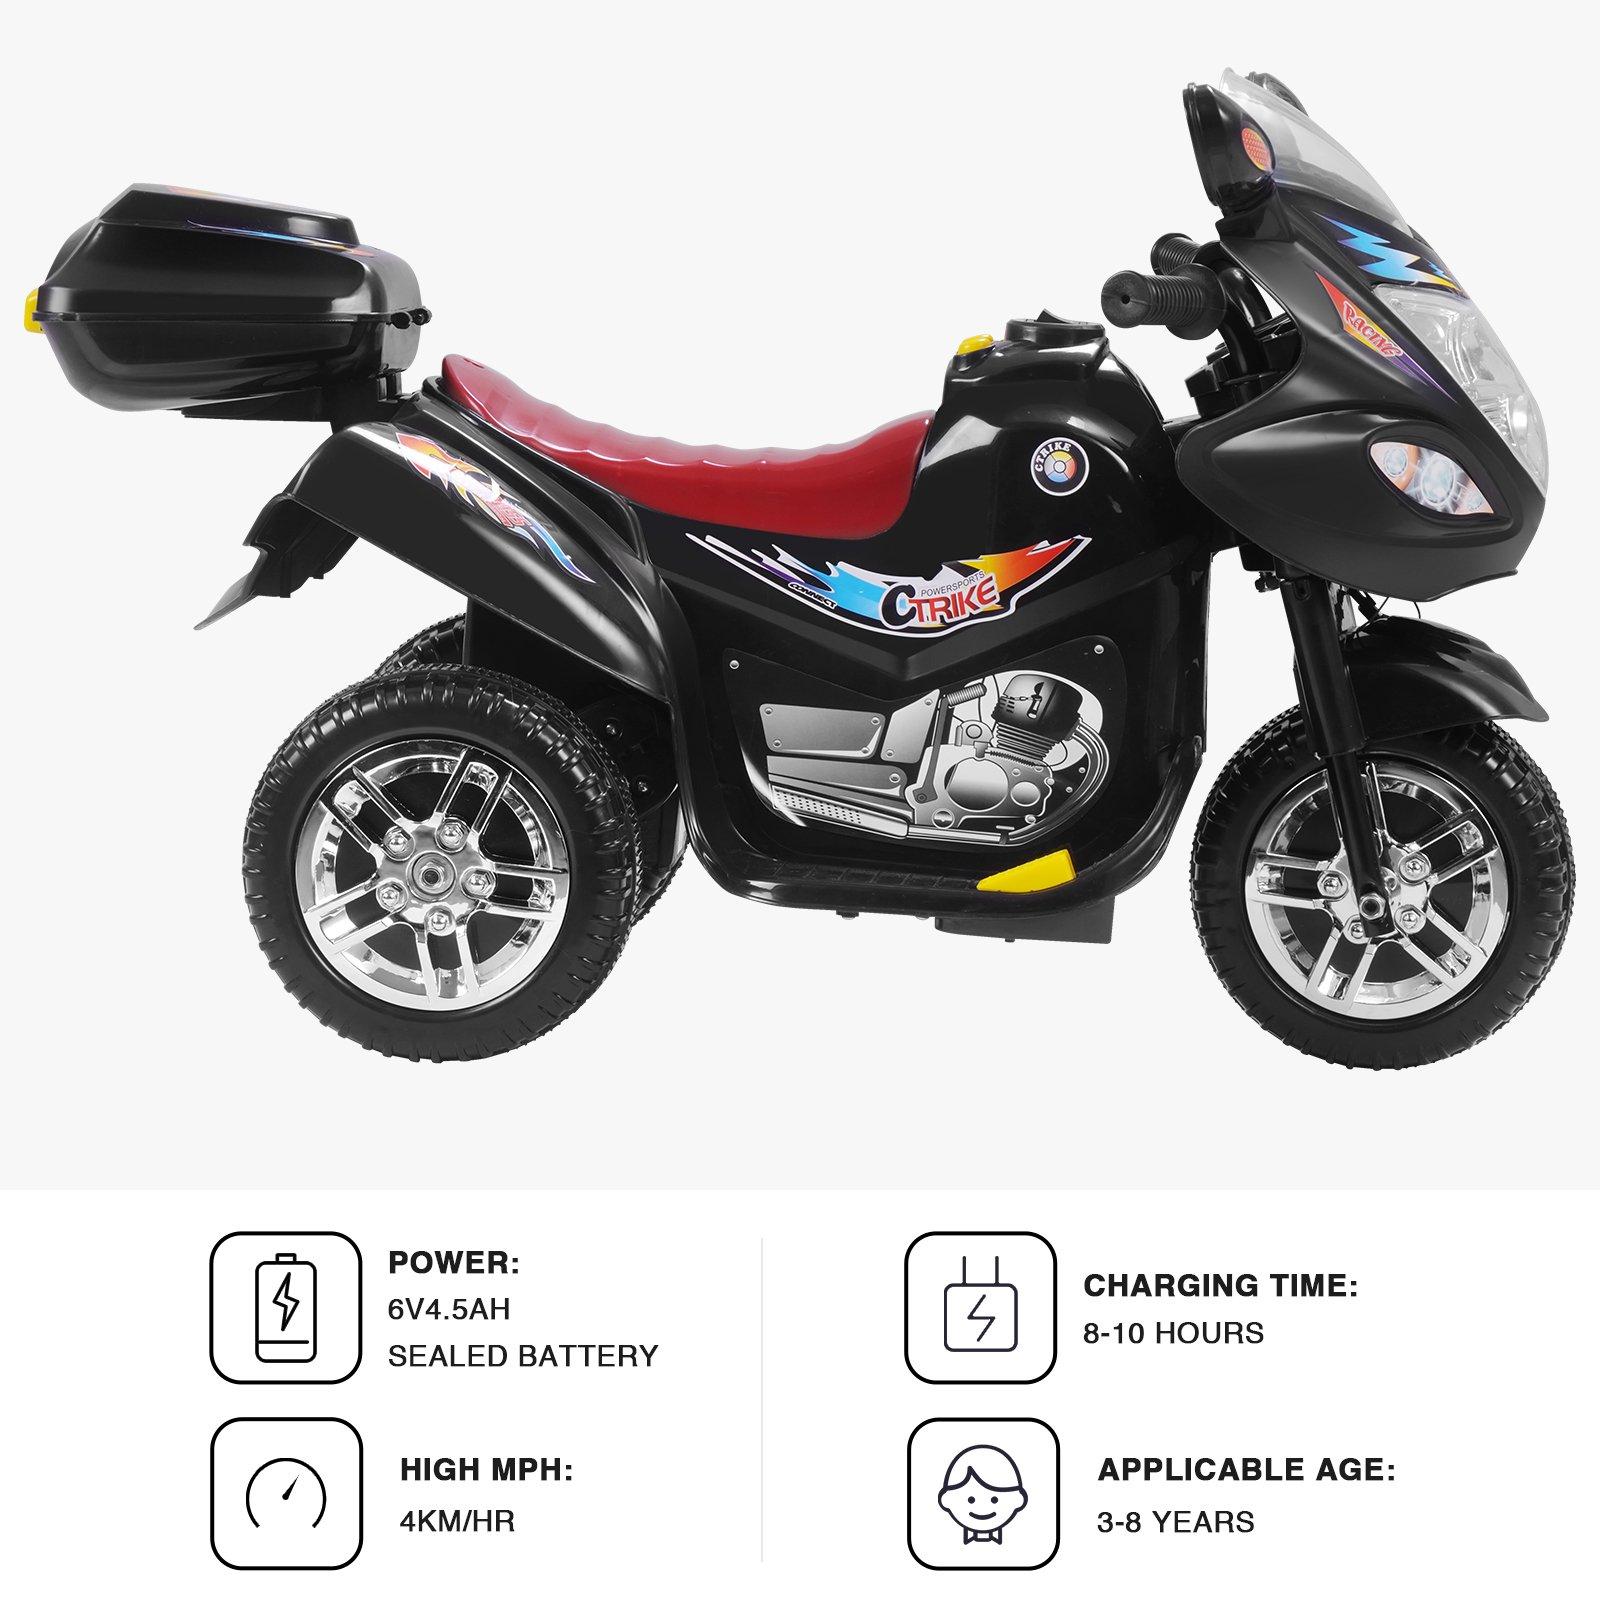 Uenjoy Murtisol Kids Ride on Motorcycle 6V Electric Motorcycle 2 Wheels Black by Uenjoy (Image #3)